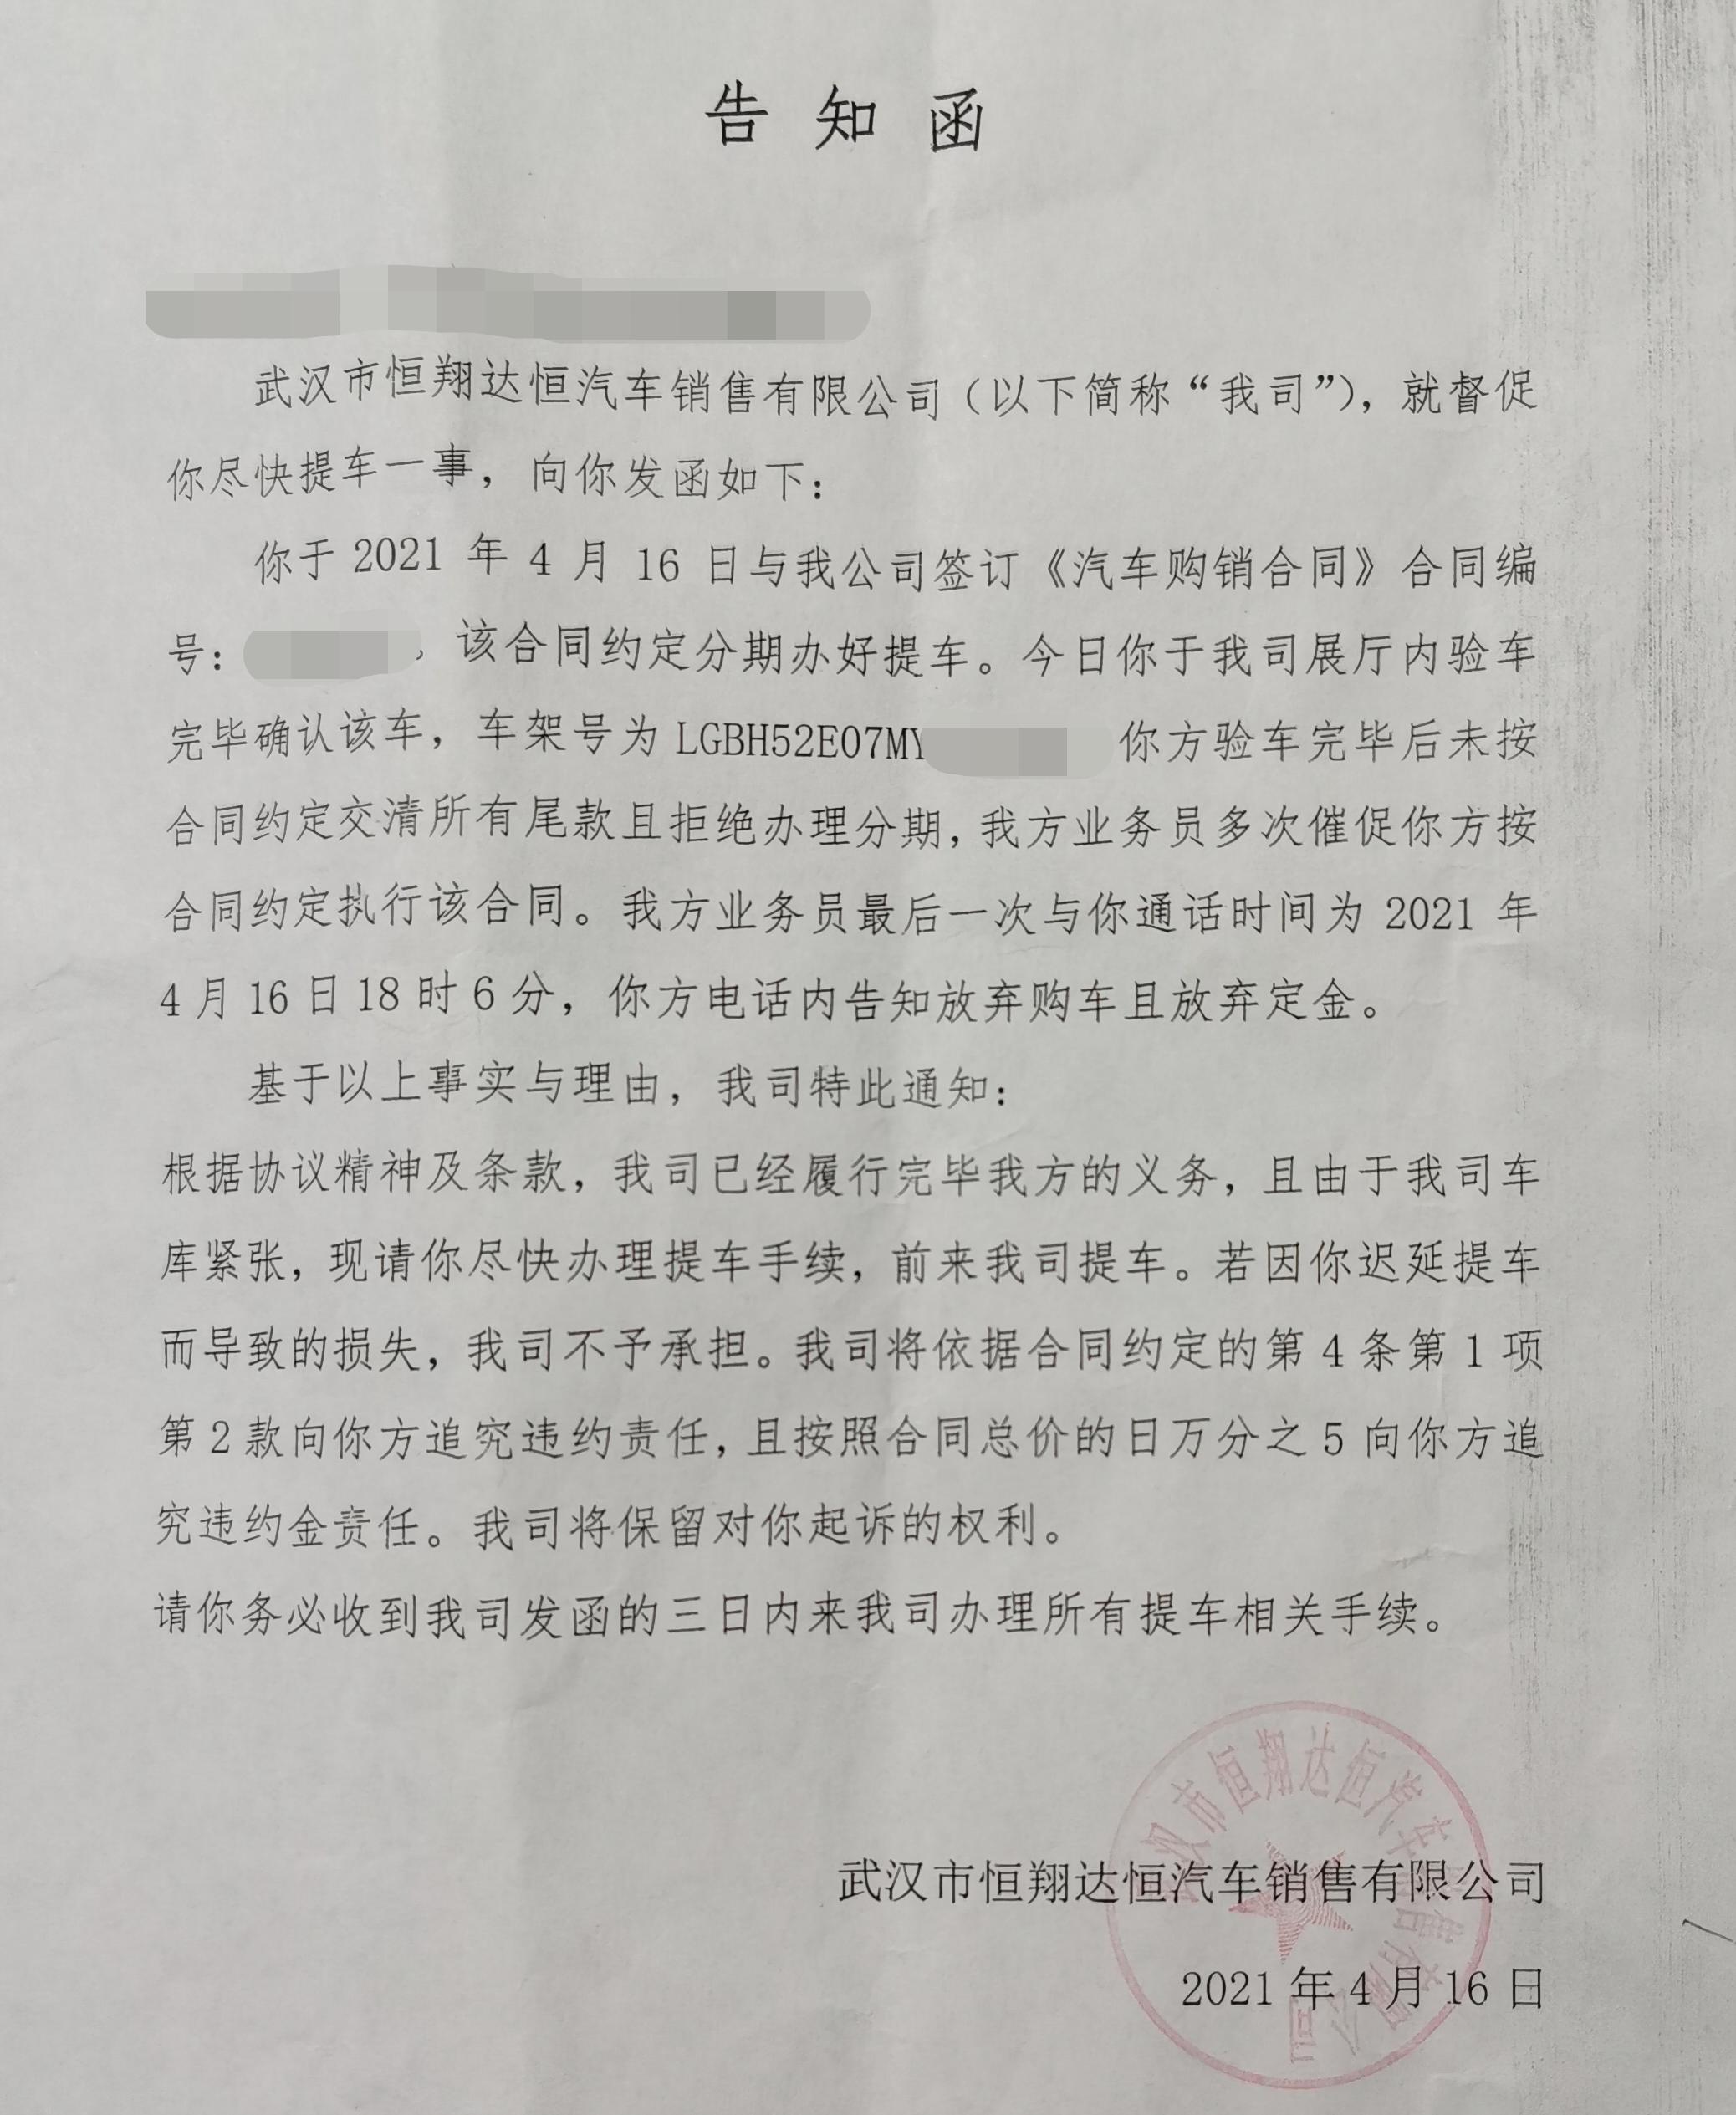 4S店发来《告知函》称将追究违约责任。